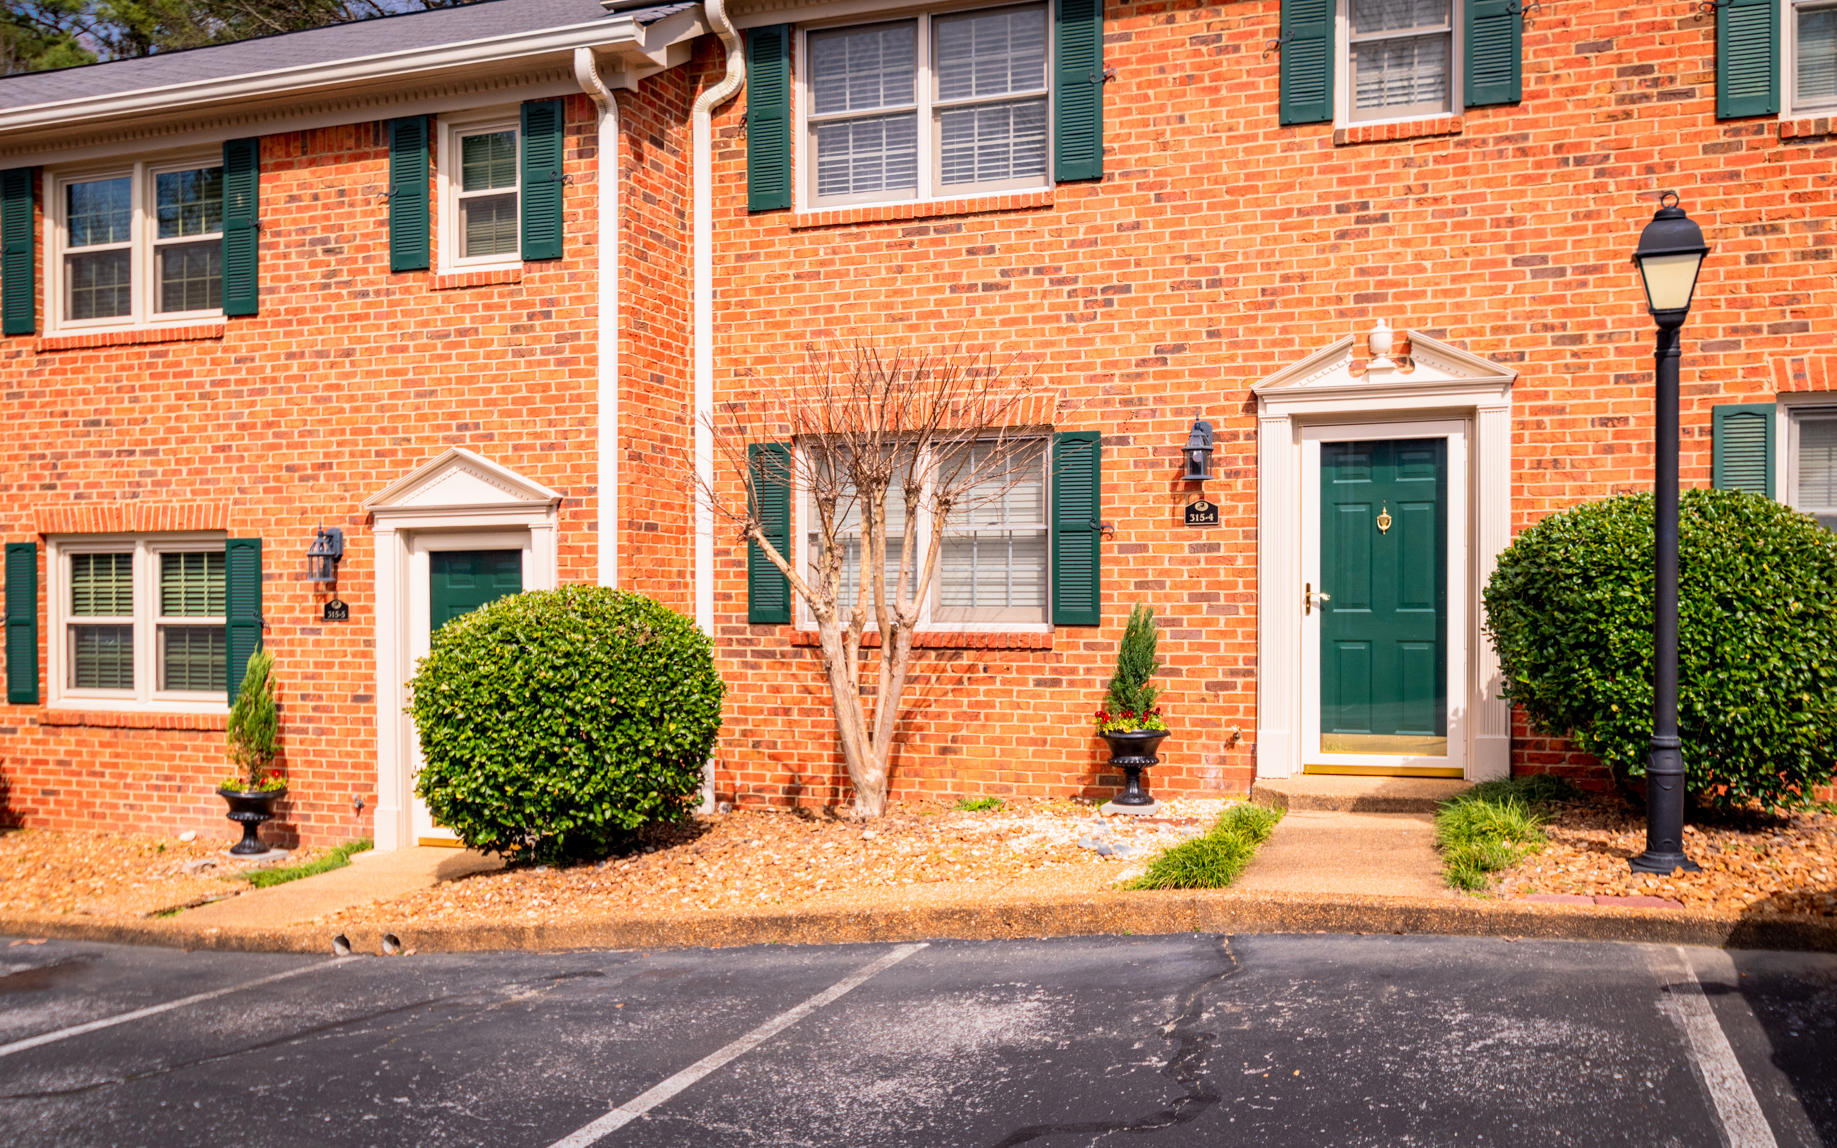 315 Mcbrien Rd, Chattanooga, TN 37411